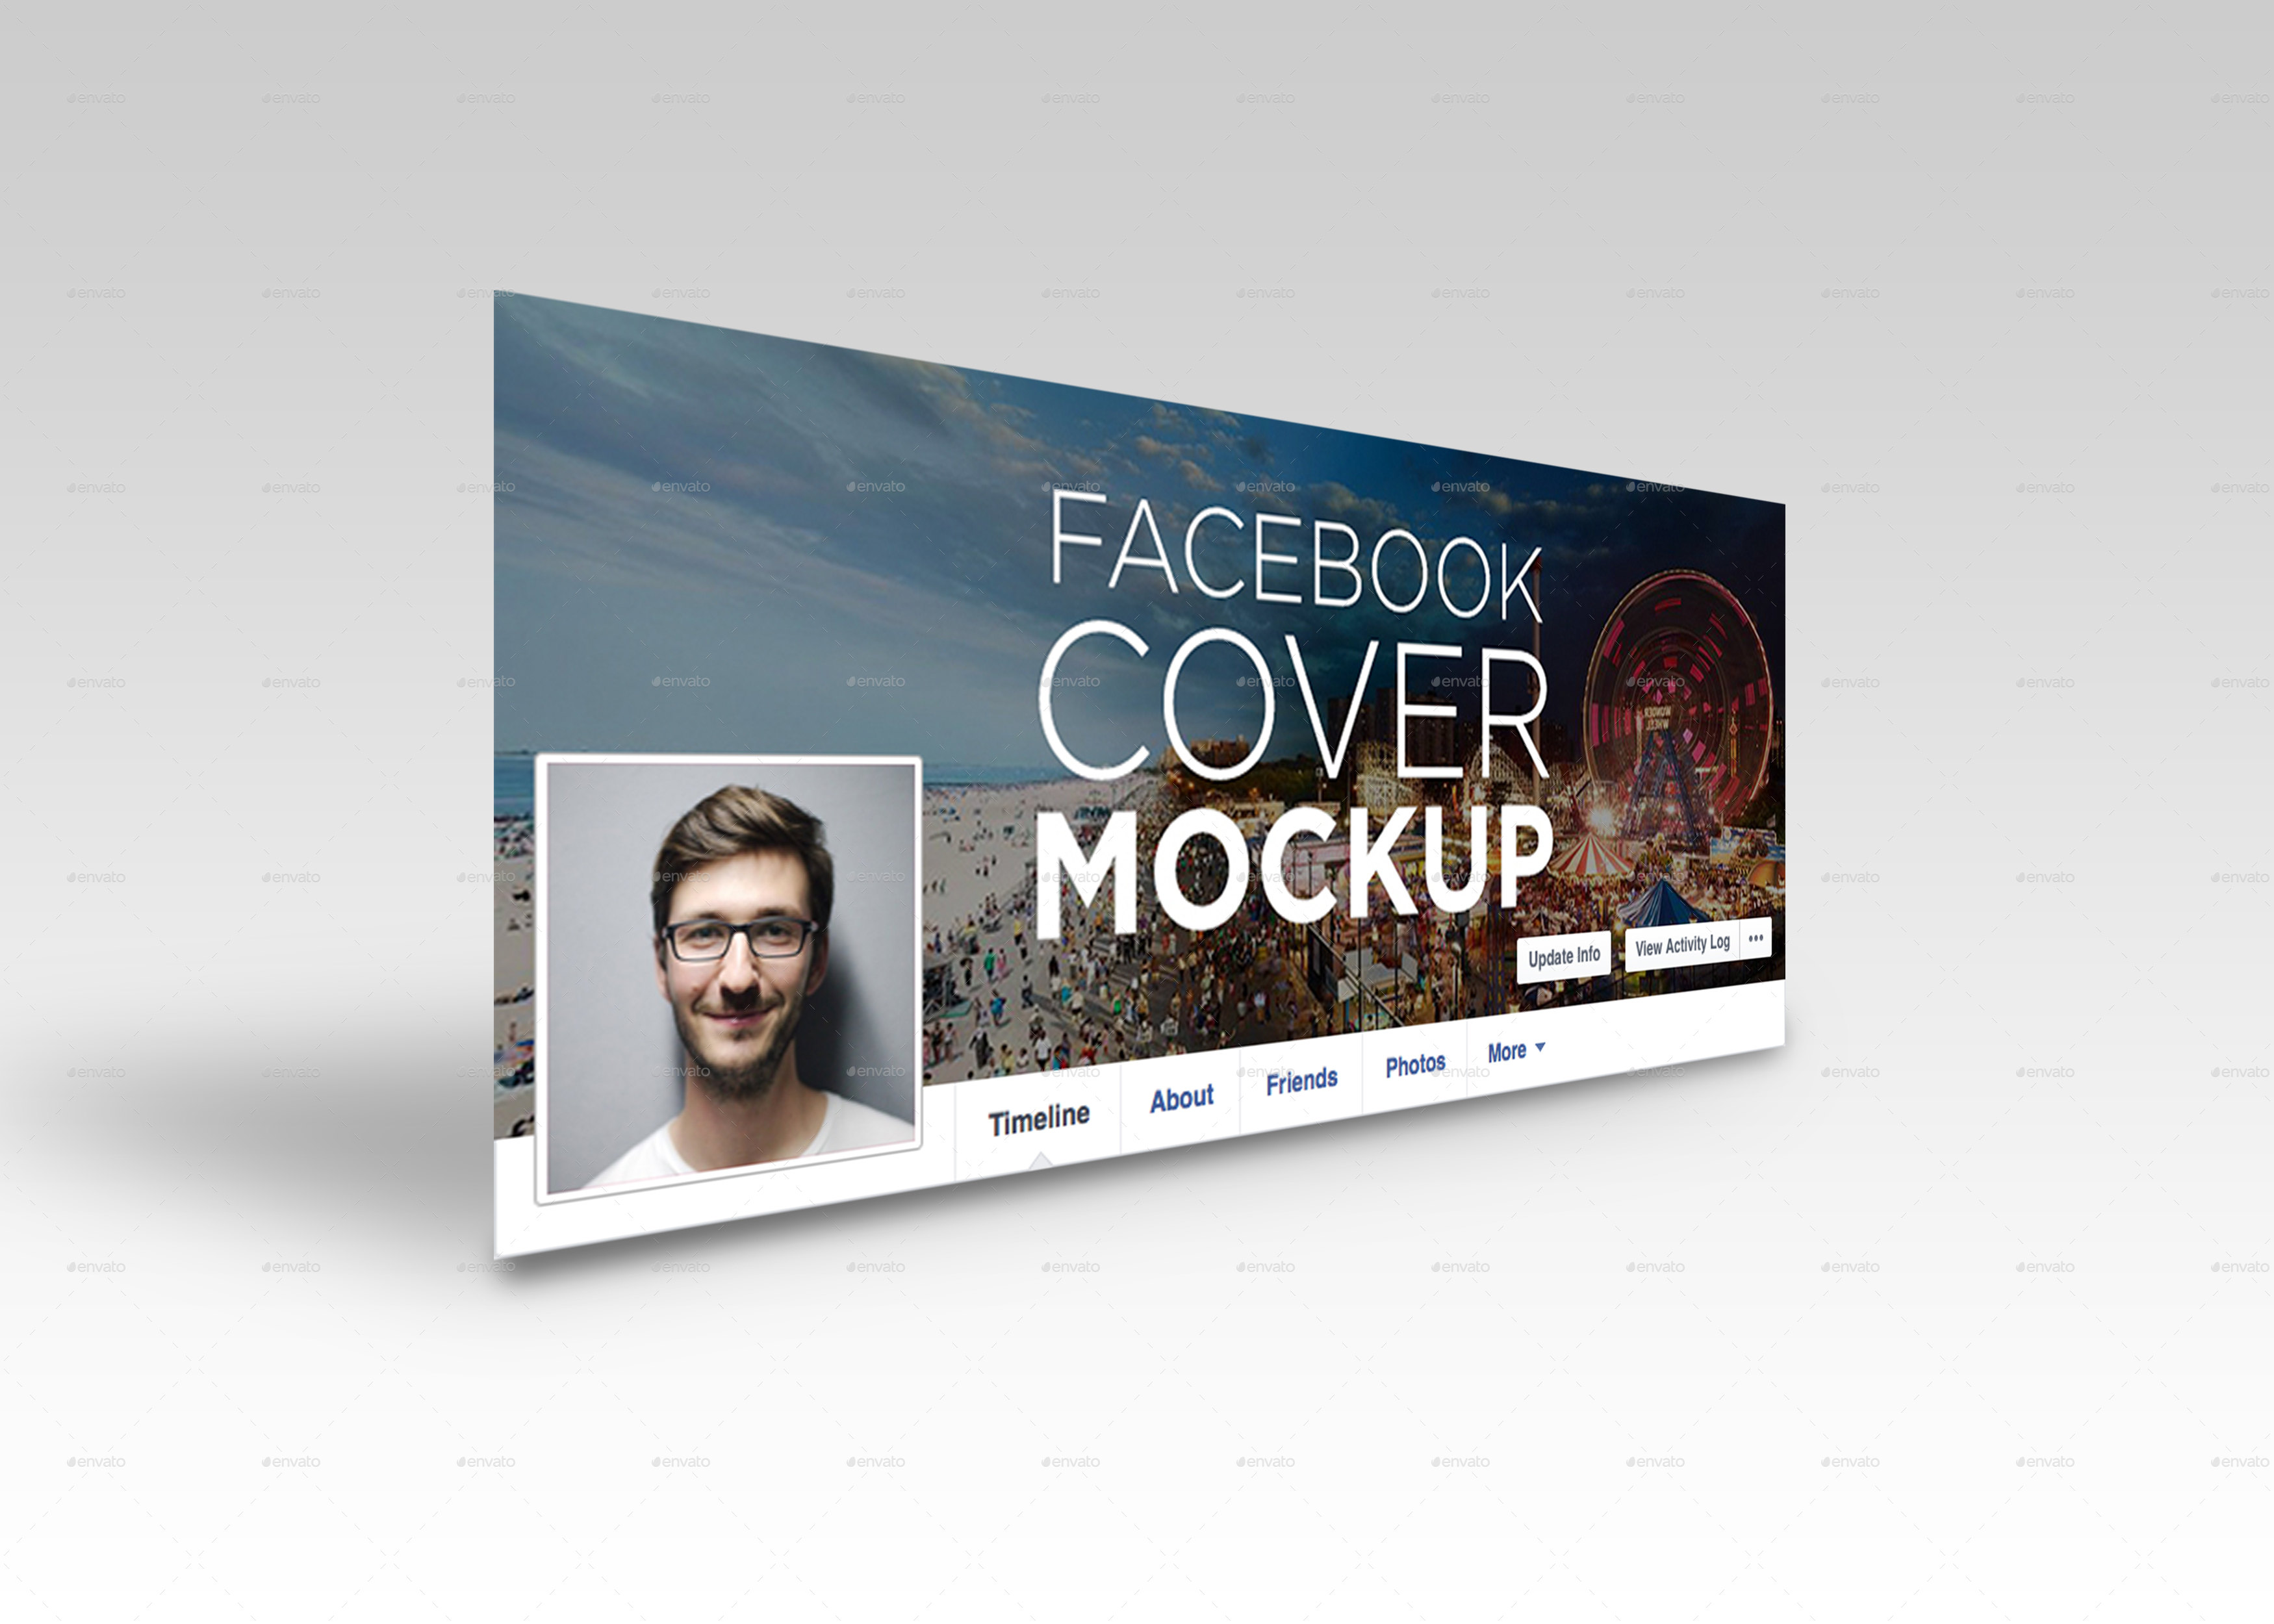 facebook mockup - Monza berglauf-verband com